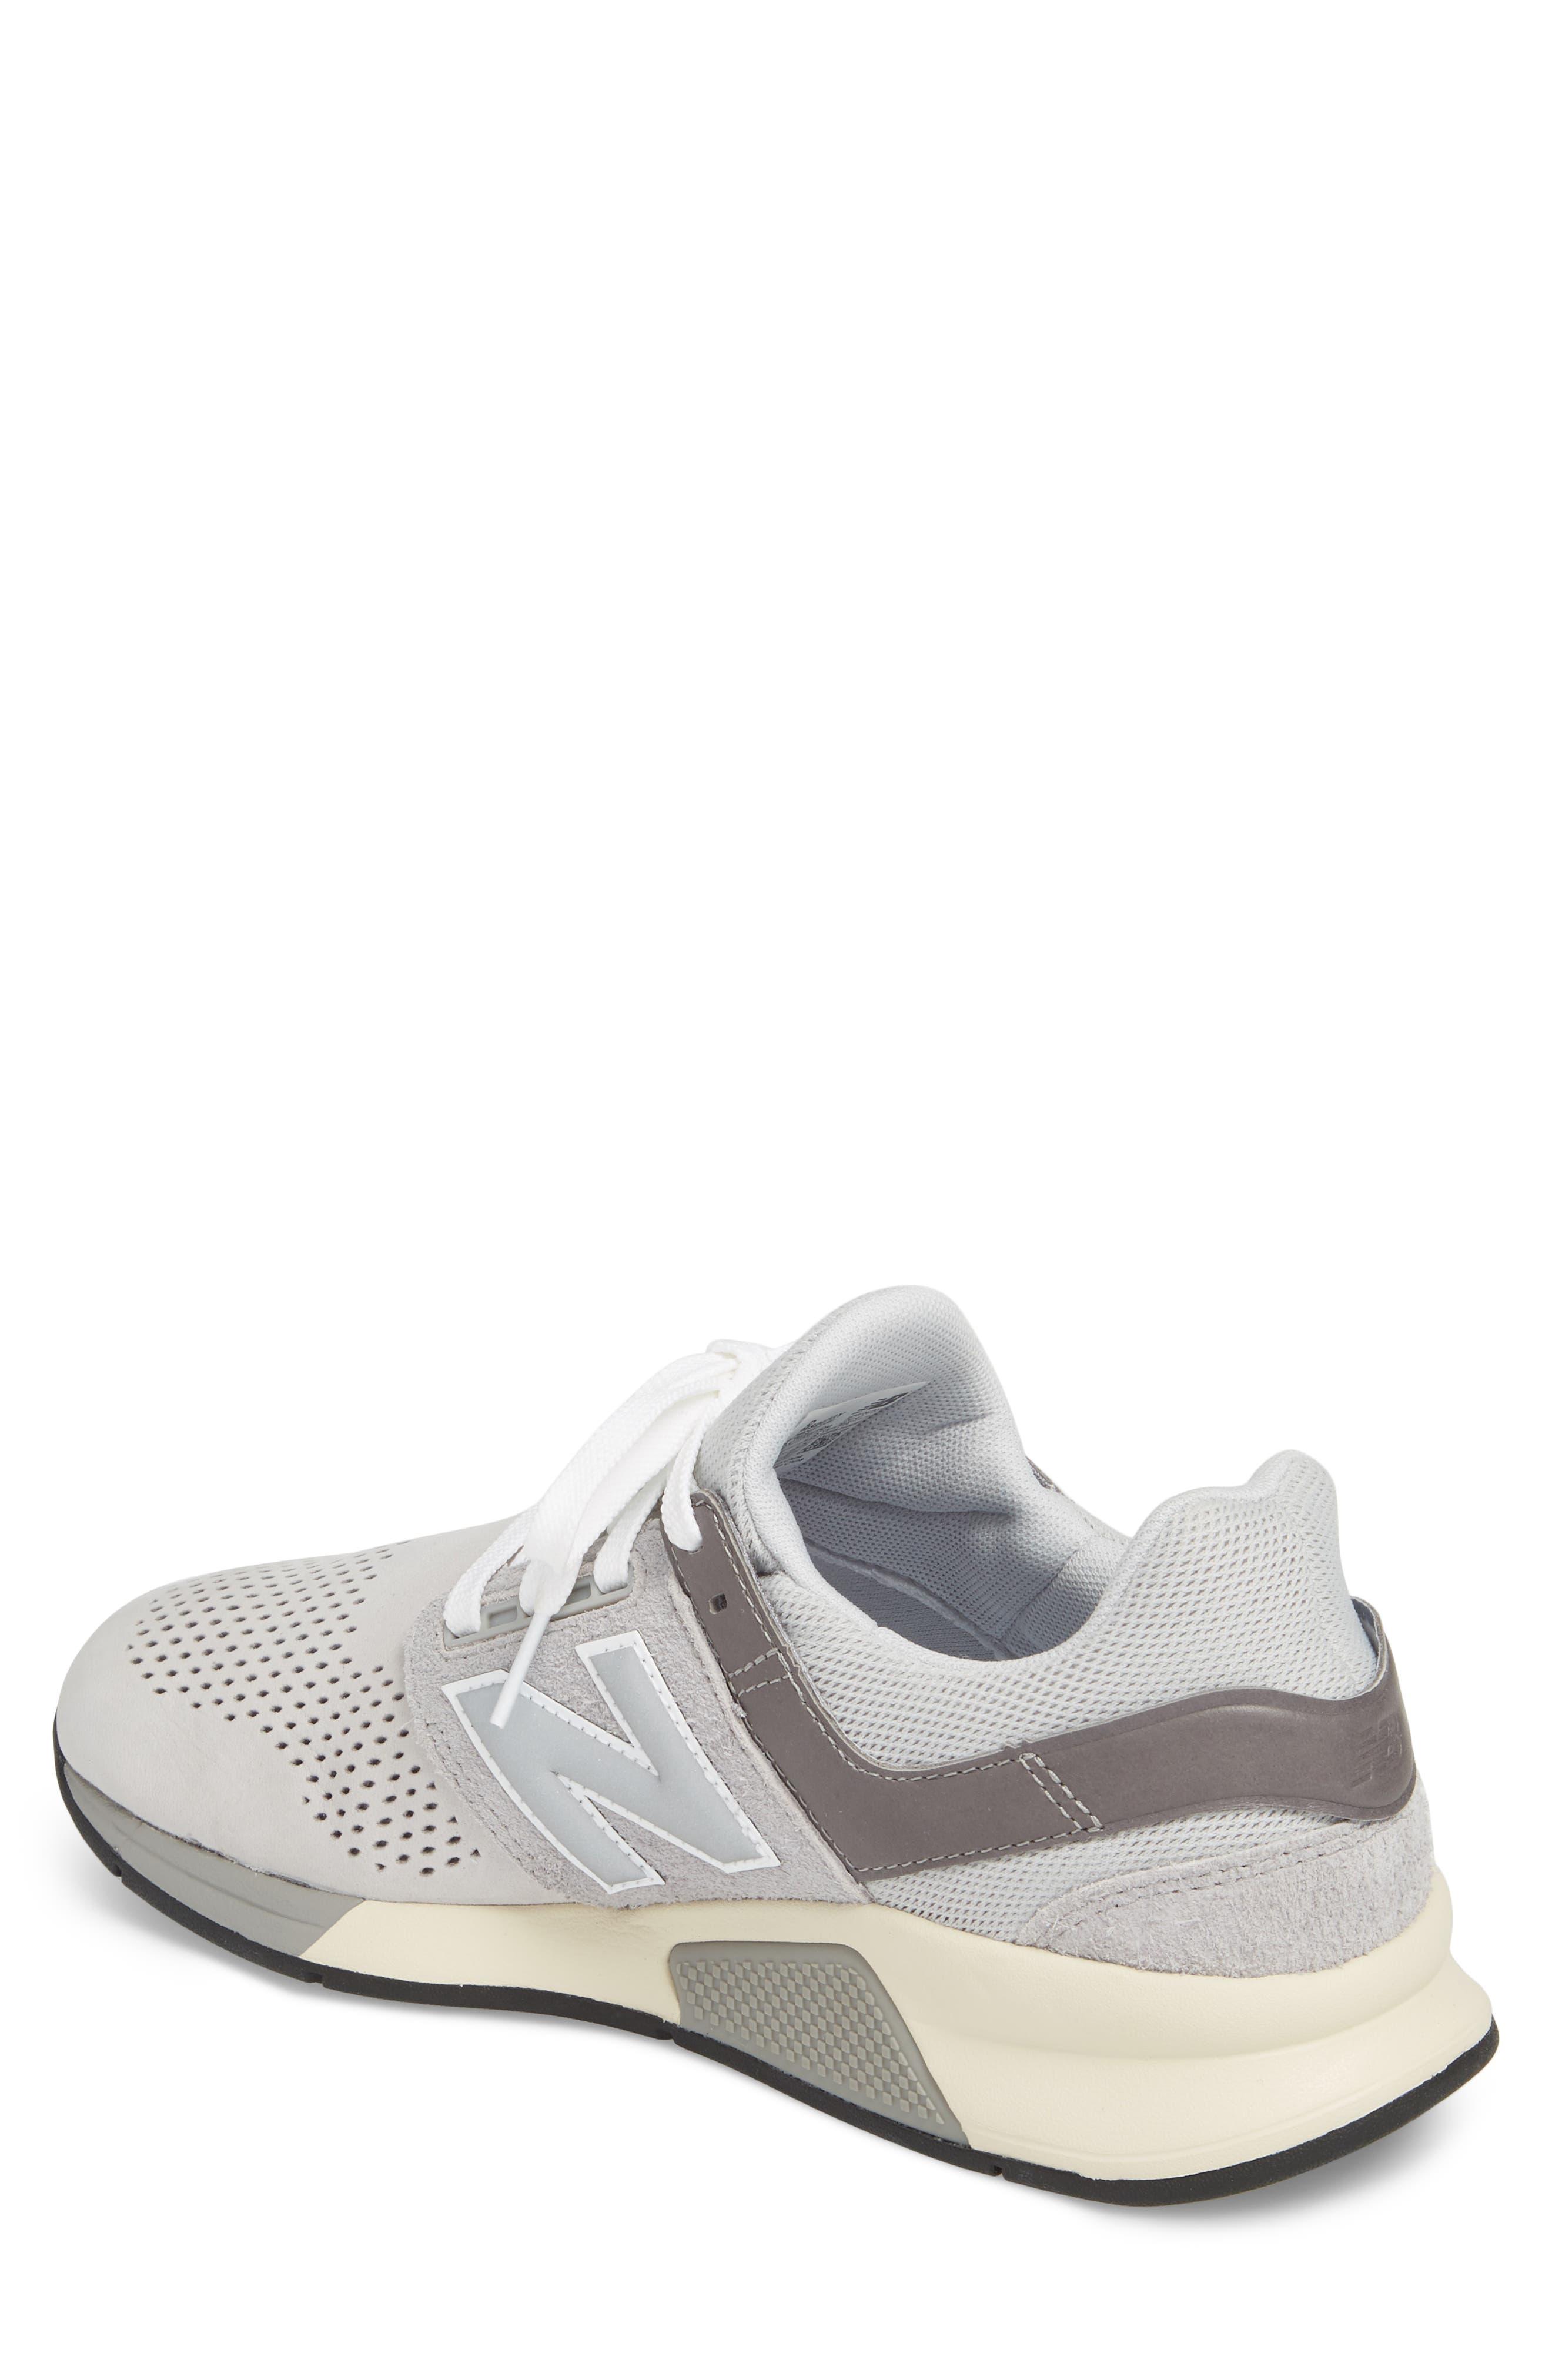 247 v2 Sneaker,                             Alternate thumbnail 2, color,                             Rain Cloud Leather